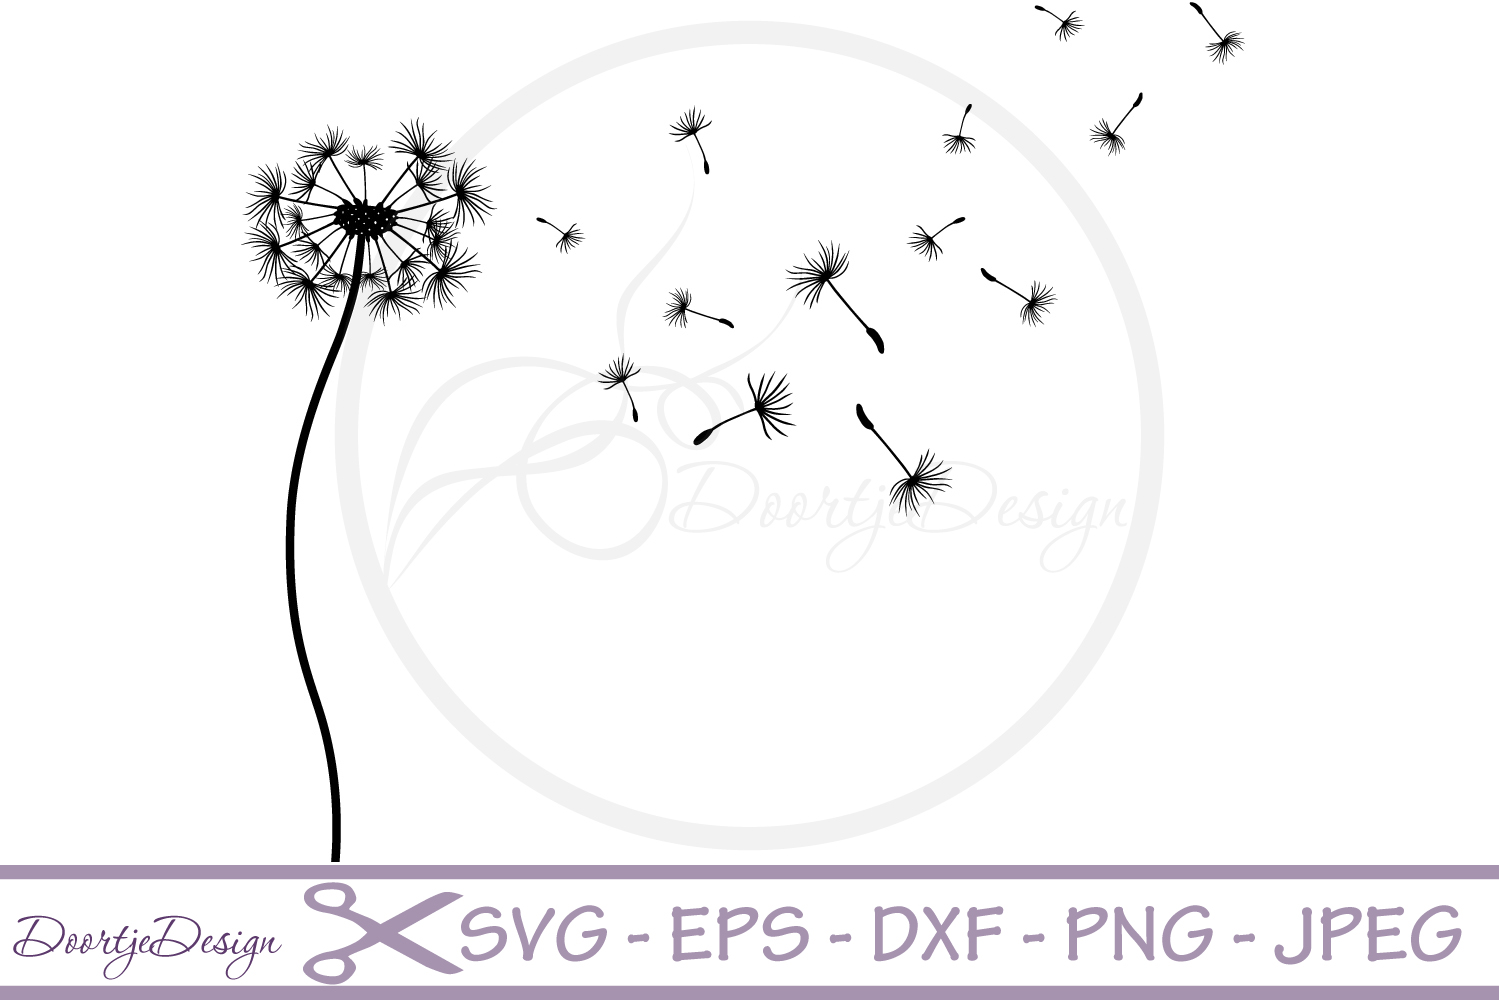 Dandelion SVG vector files